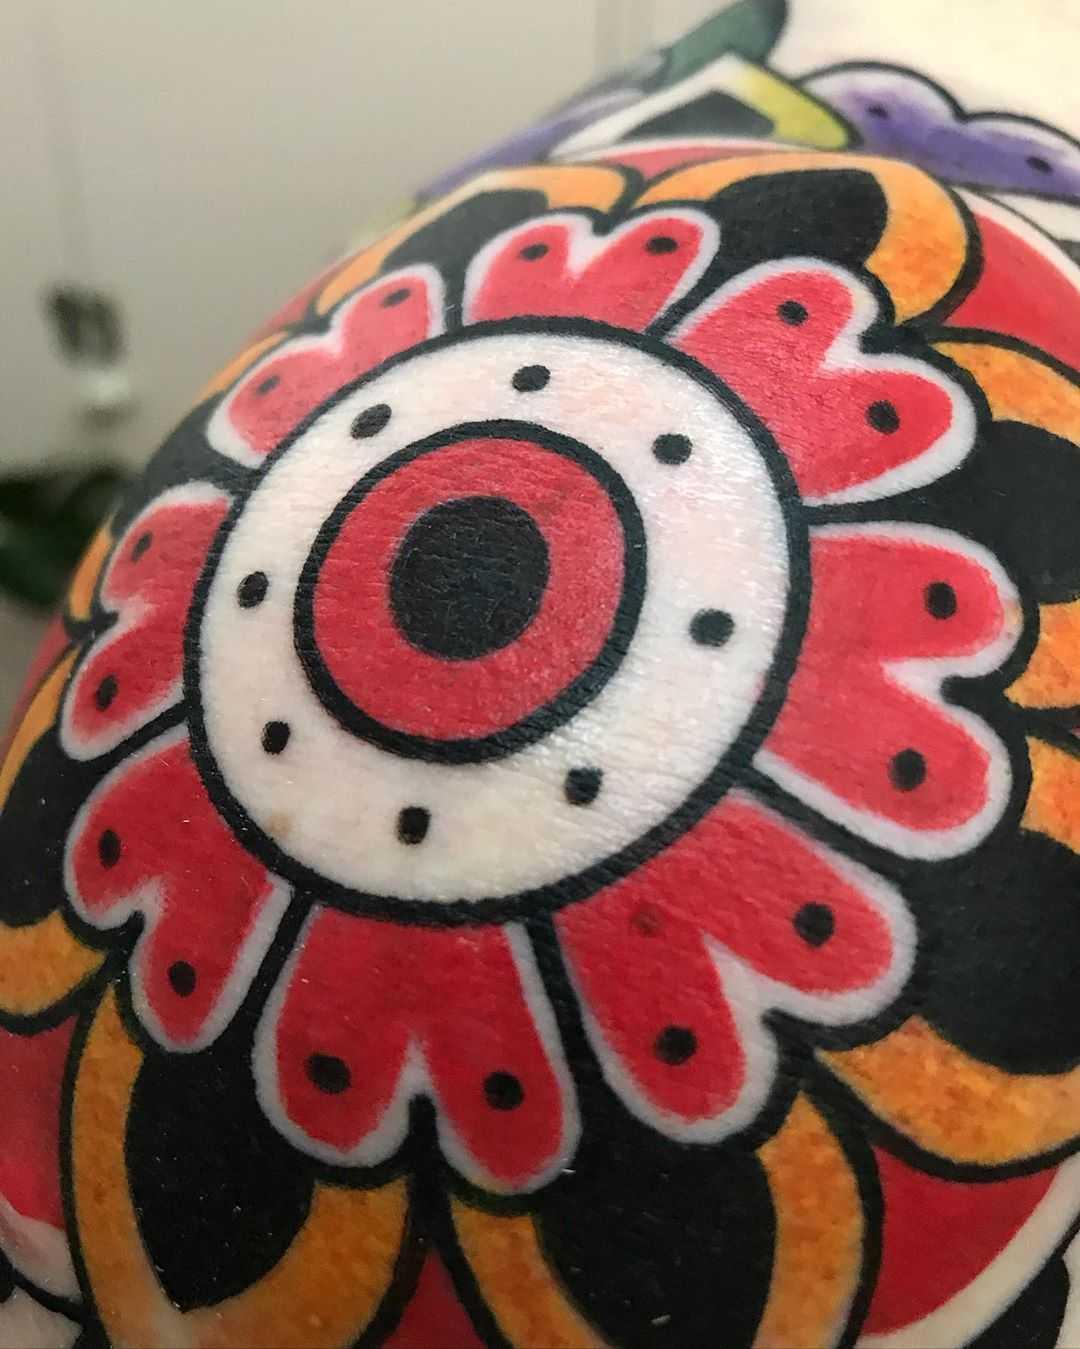 Traditional flower eye by tattooist Alejo GMZ